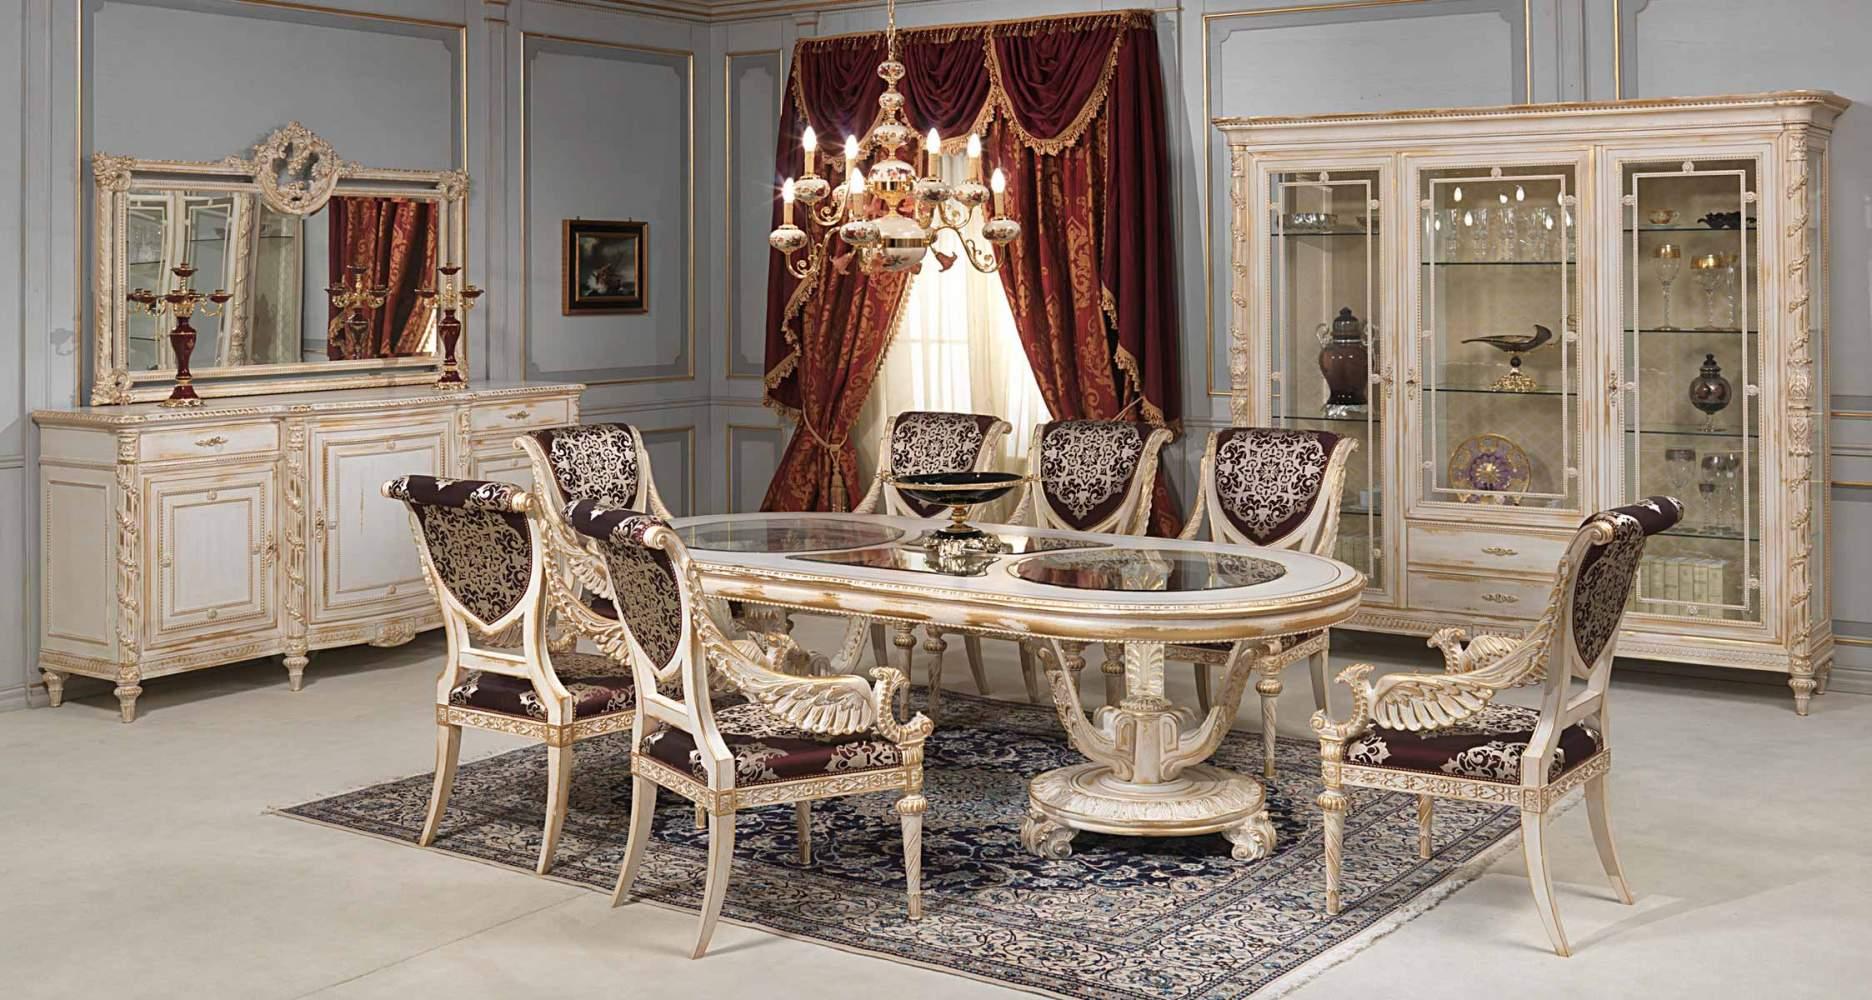 Mobili Sala Da Pranzo Prezzi : Sala da pranzo white and gold in stile luigi xvi vimercati meda